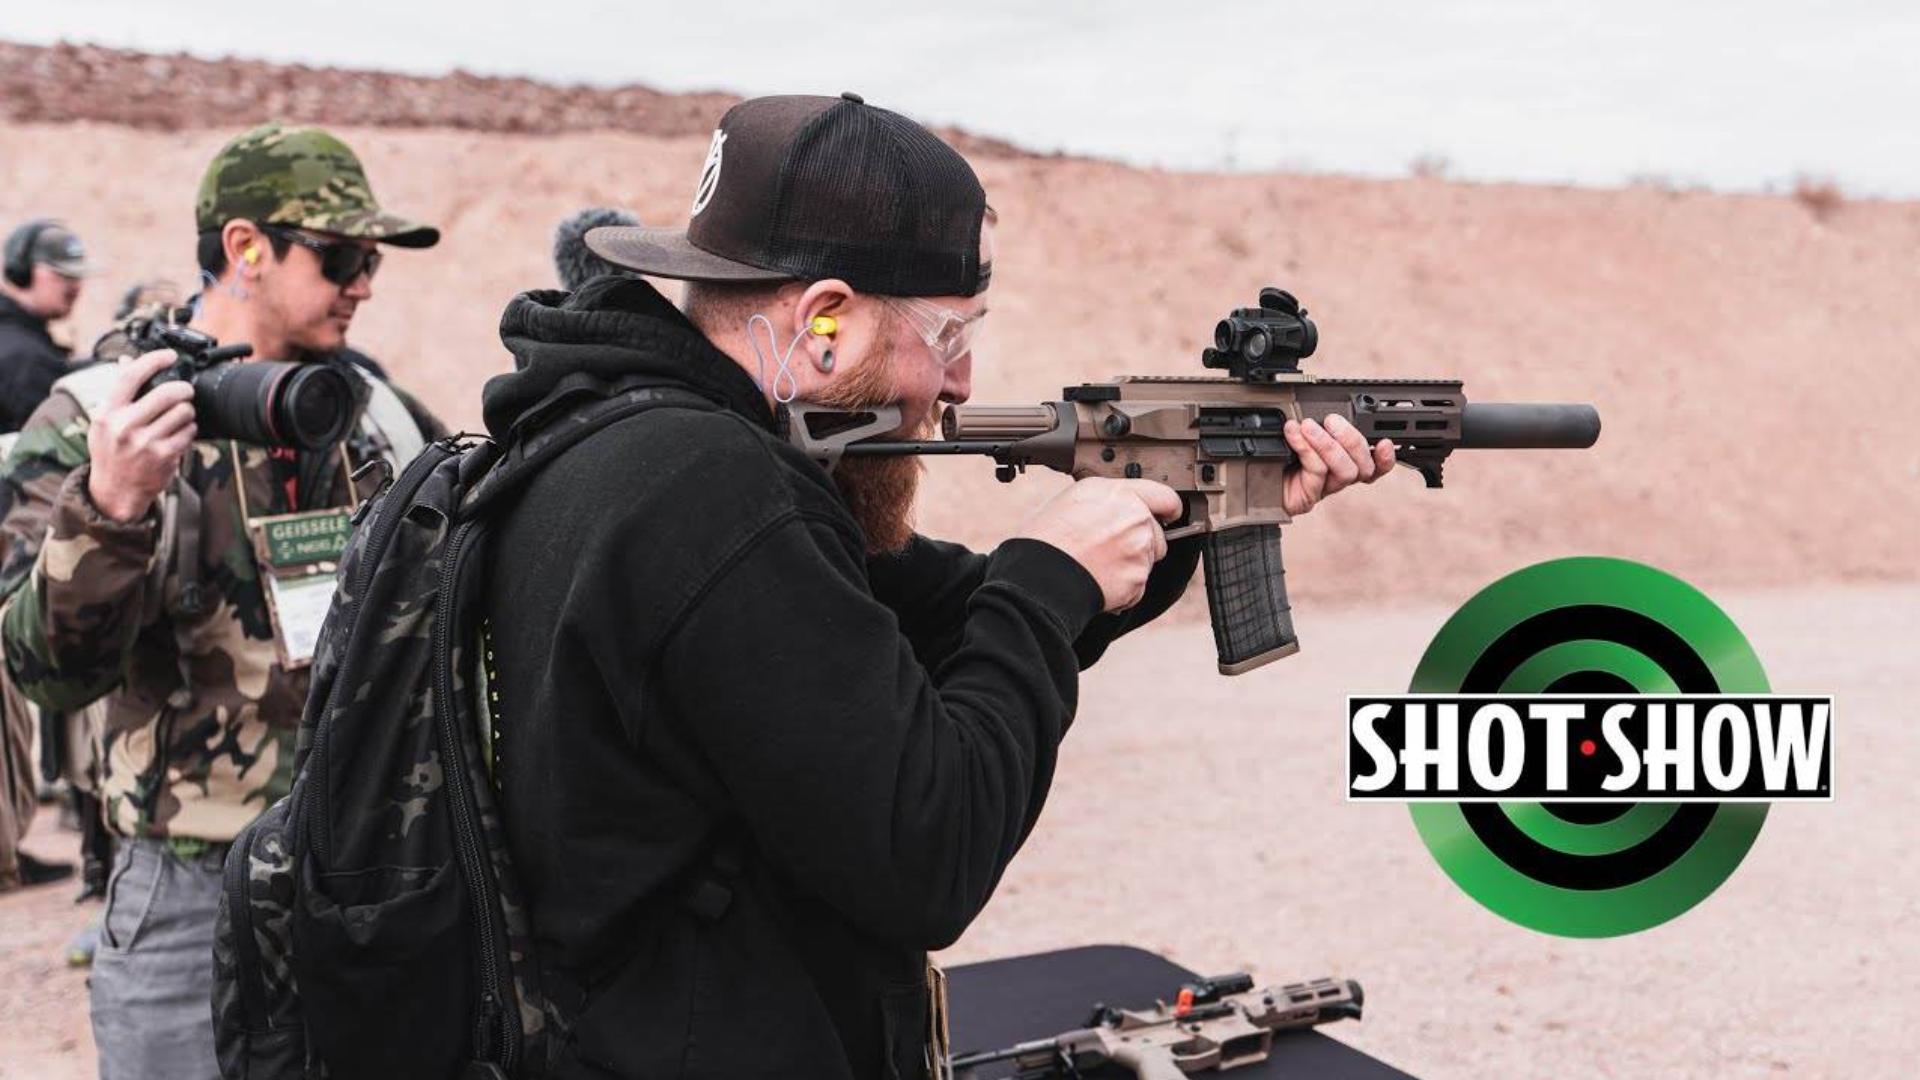 [Talon Sei]去SHOT Show 2020试射各种新枪